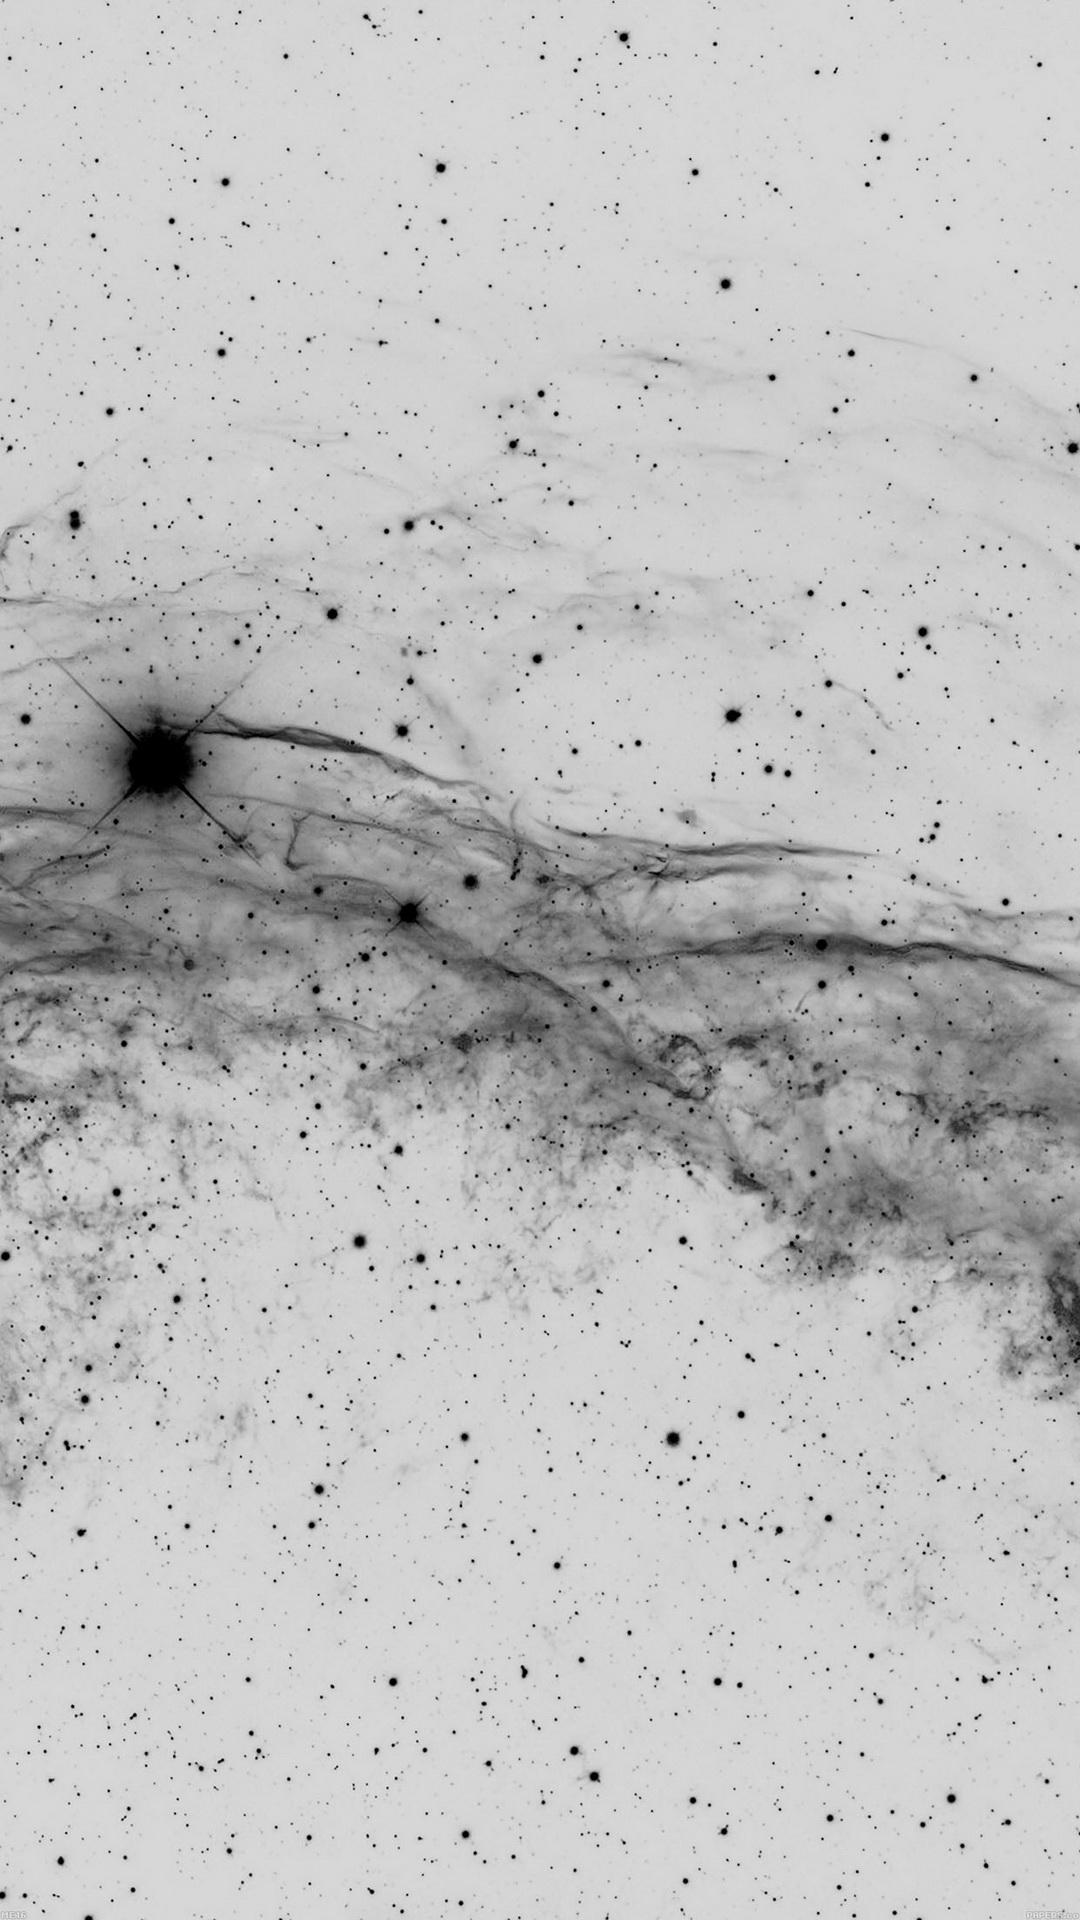 Abstract Black Stars Fog Dots